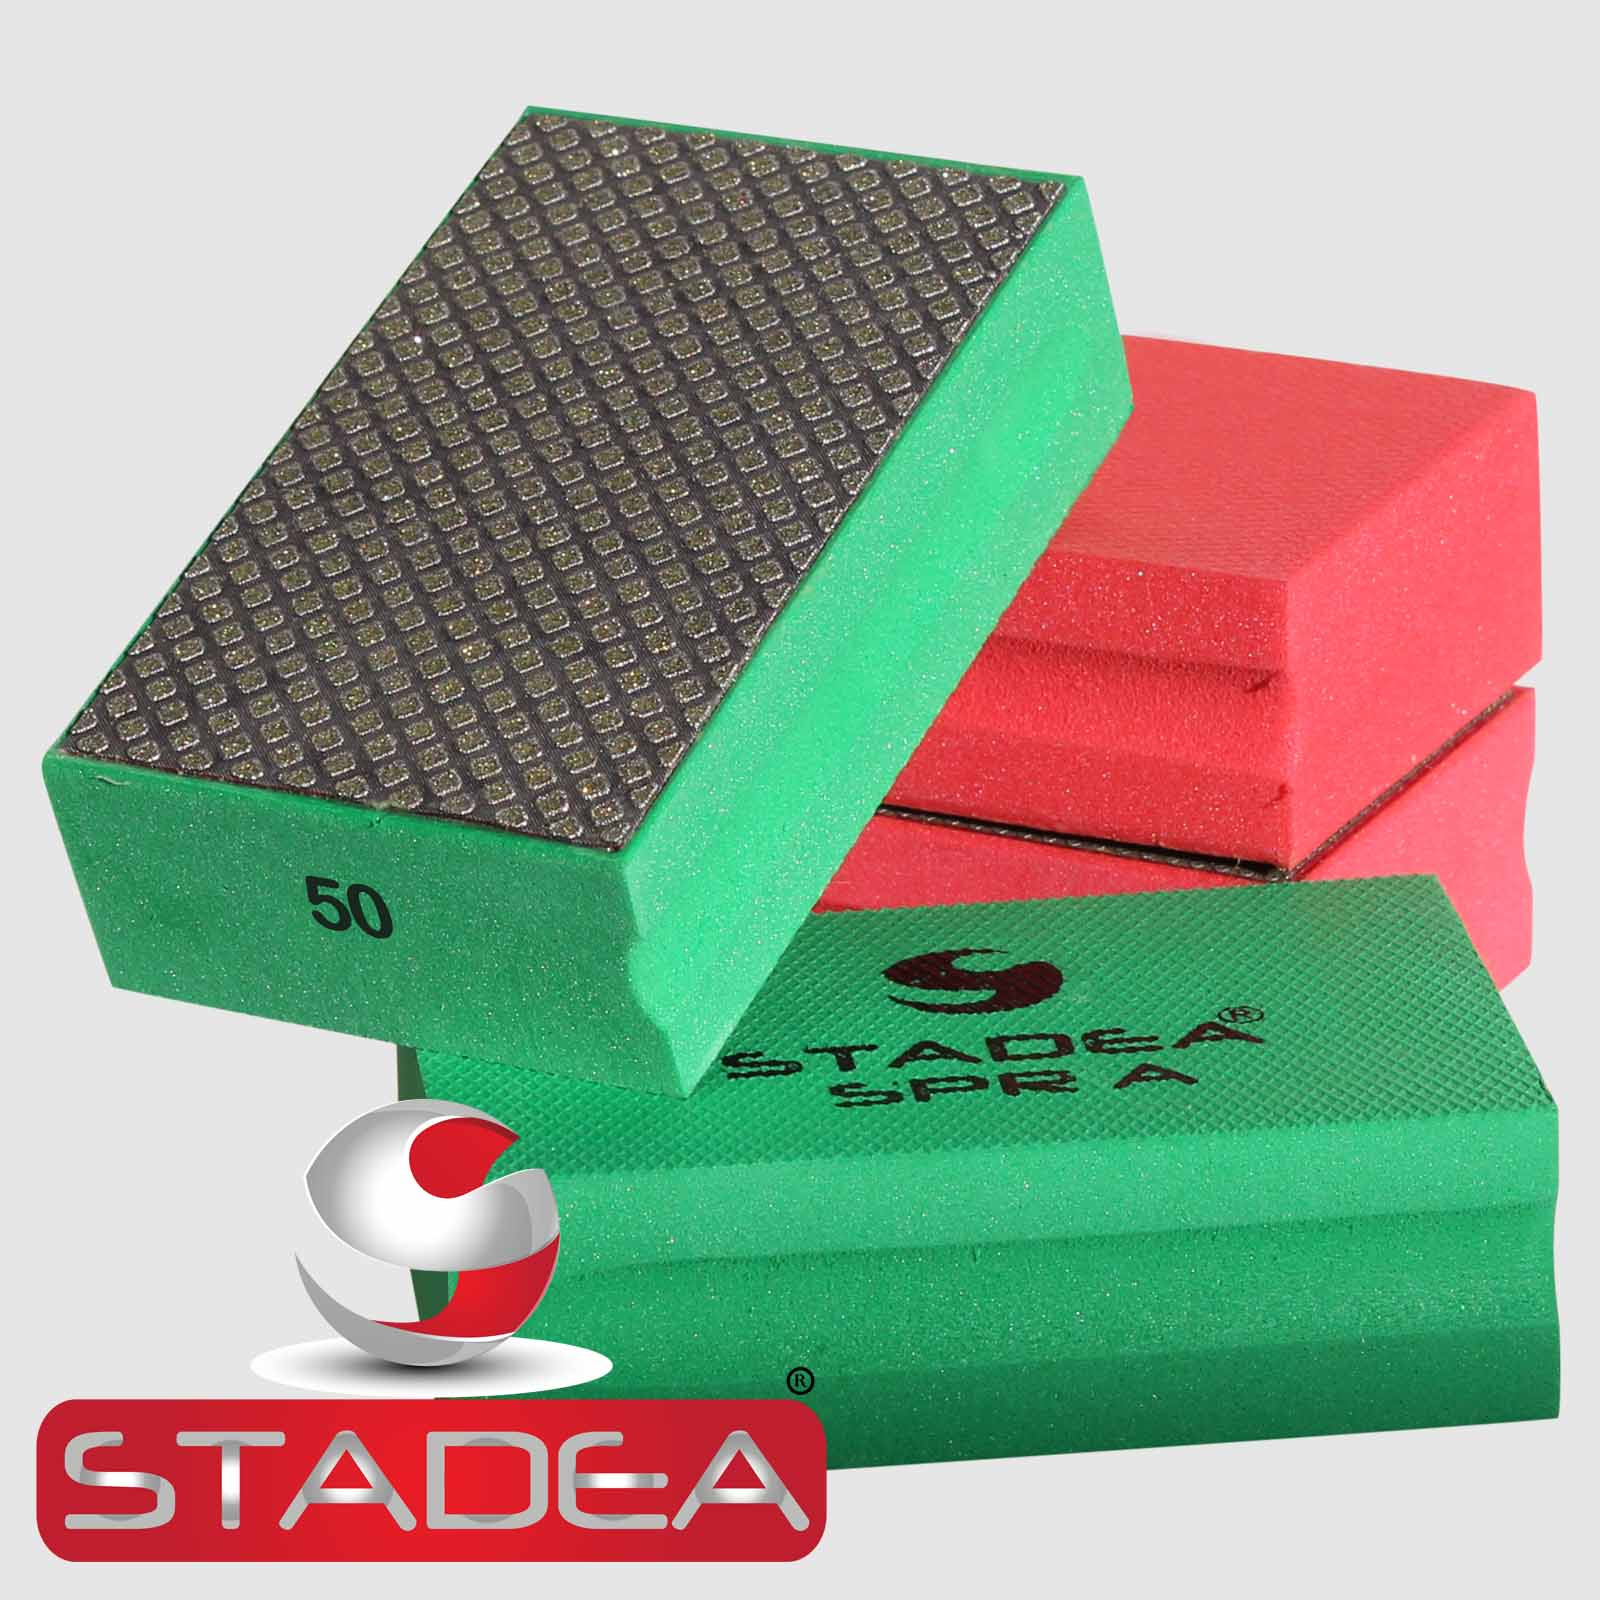 Stadea Diamond Hand Polishing Pads Set Marble Glass Stone